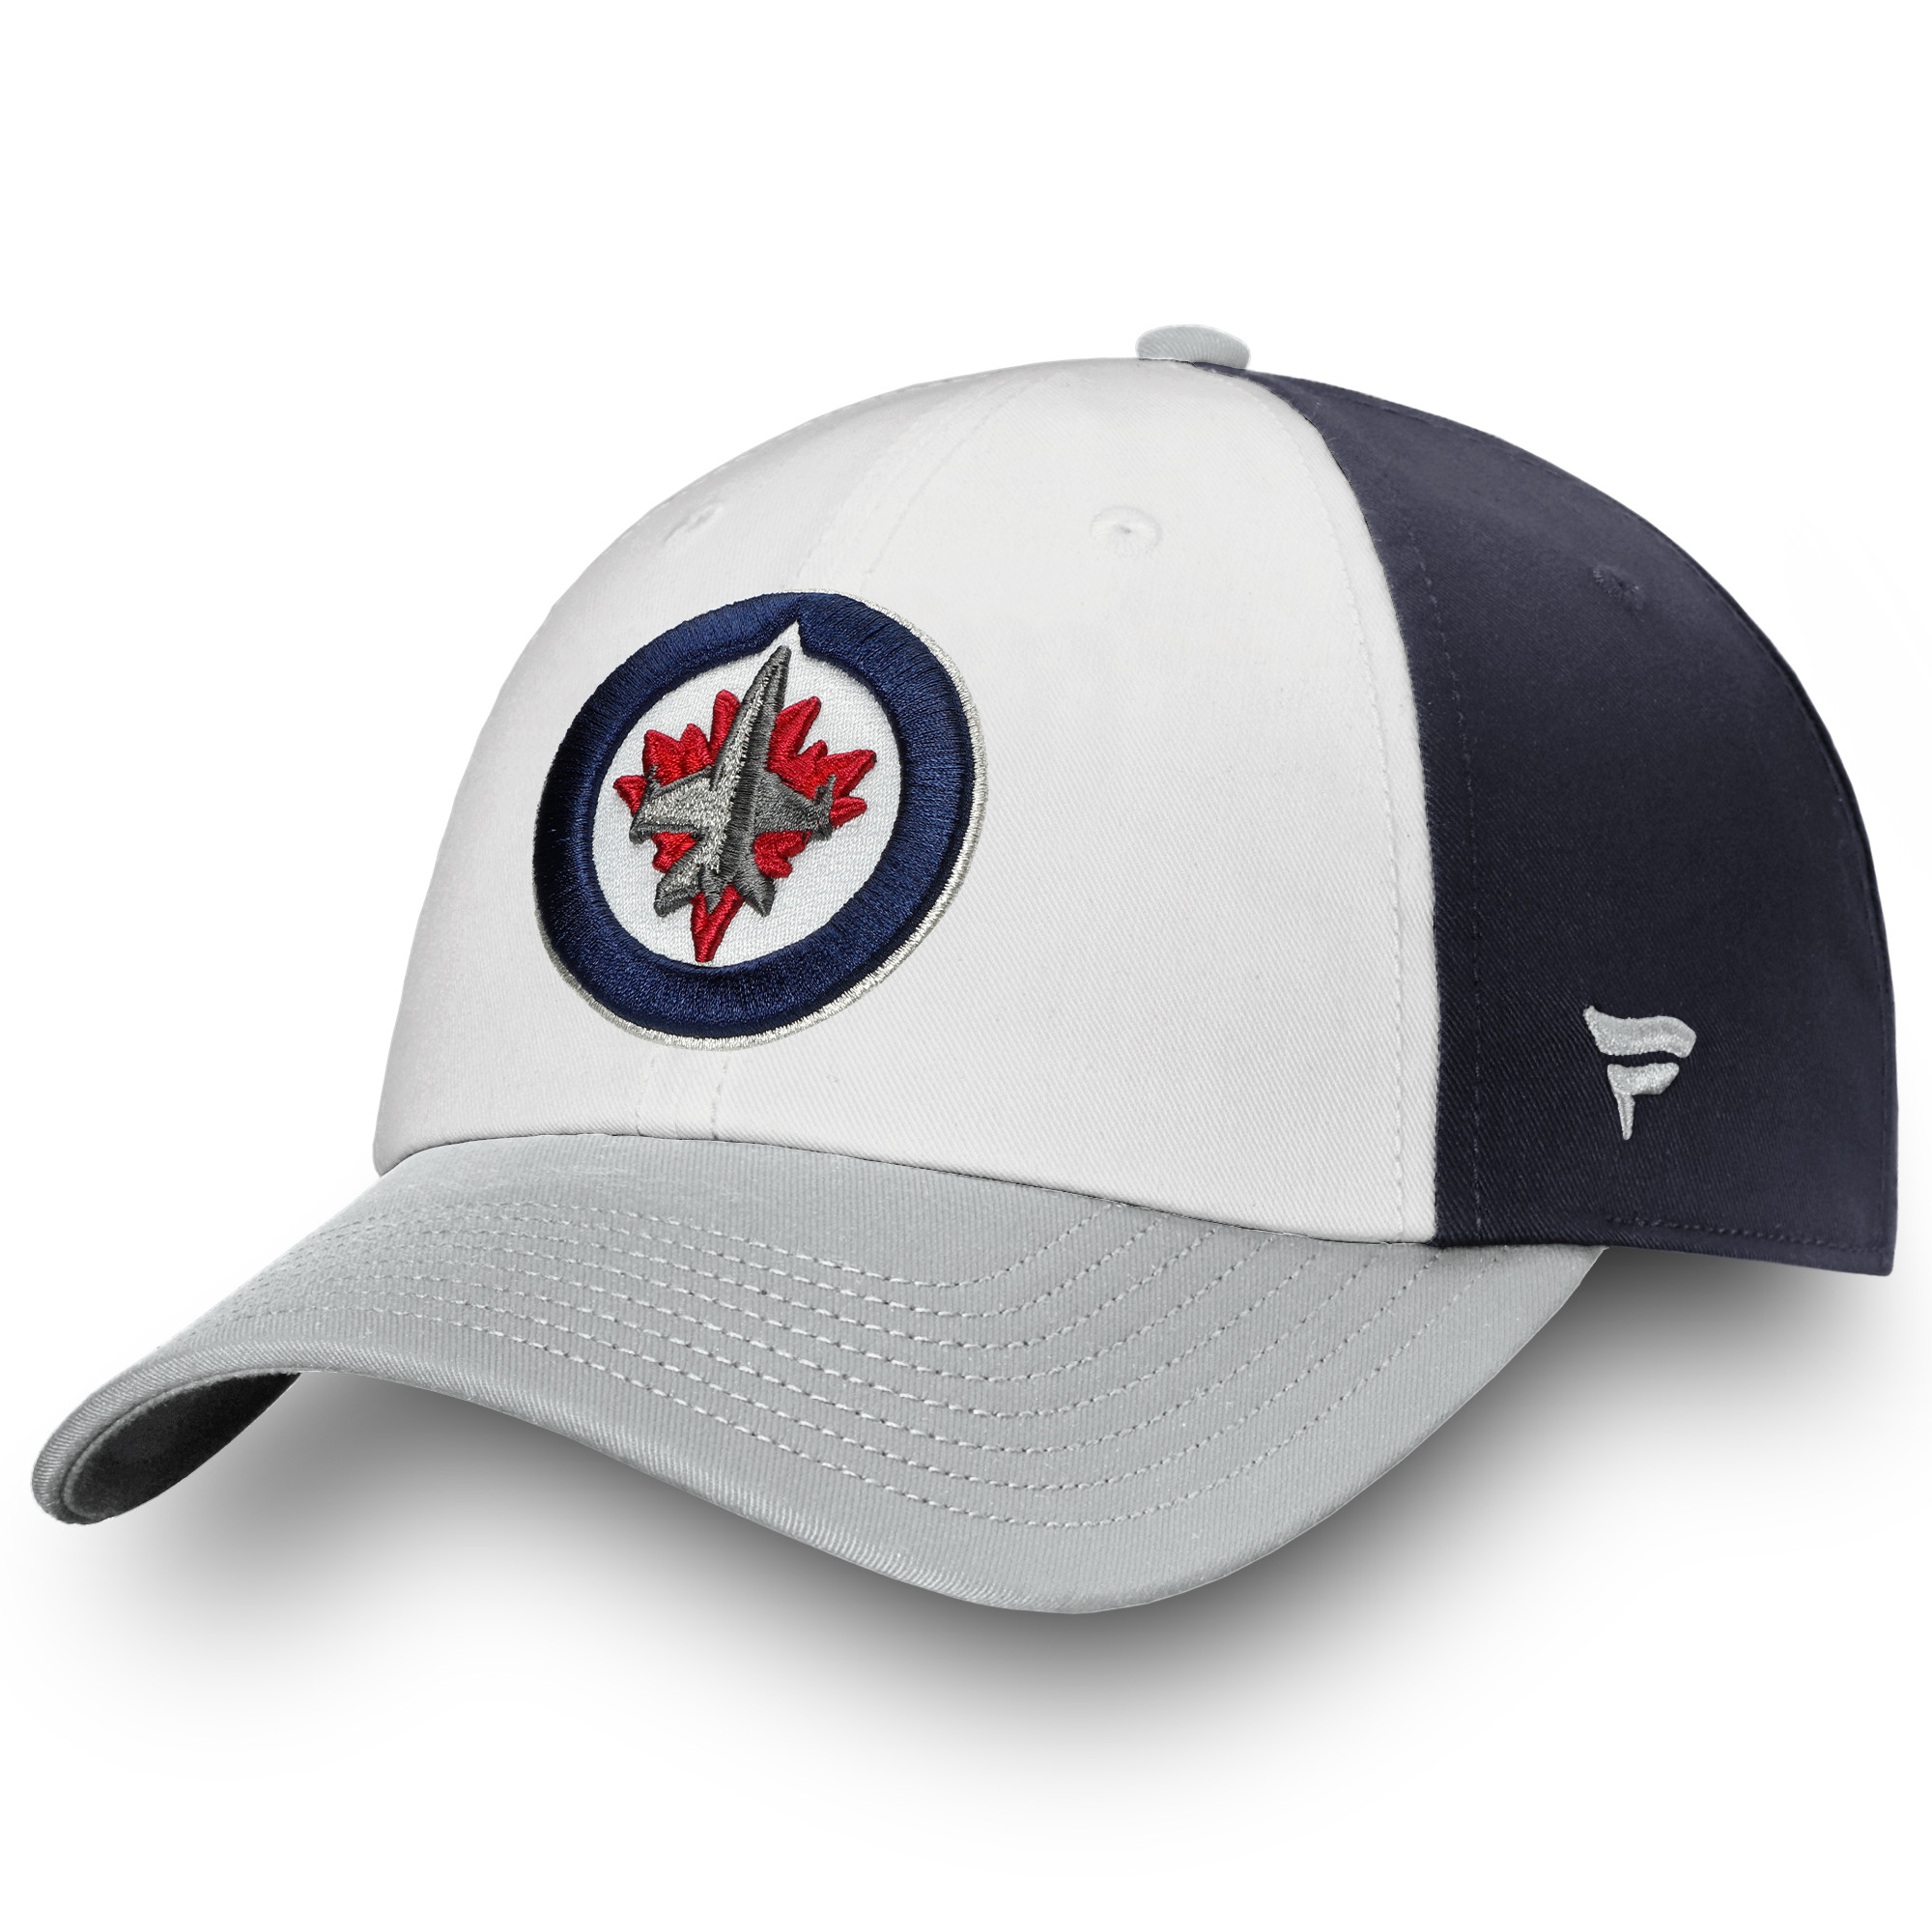 Winnipeg Jets Fanatics Branded Iconic Fundamental Adjustable Hat - White/Gray - OSFA